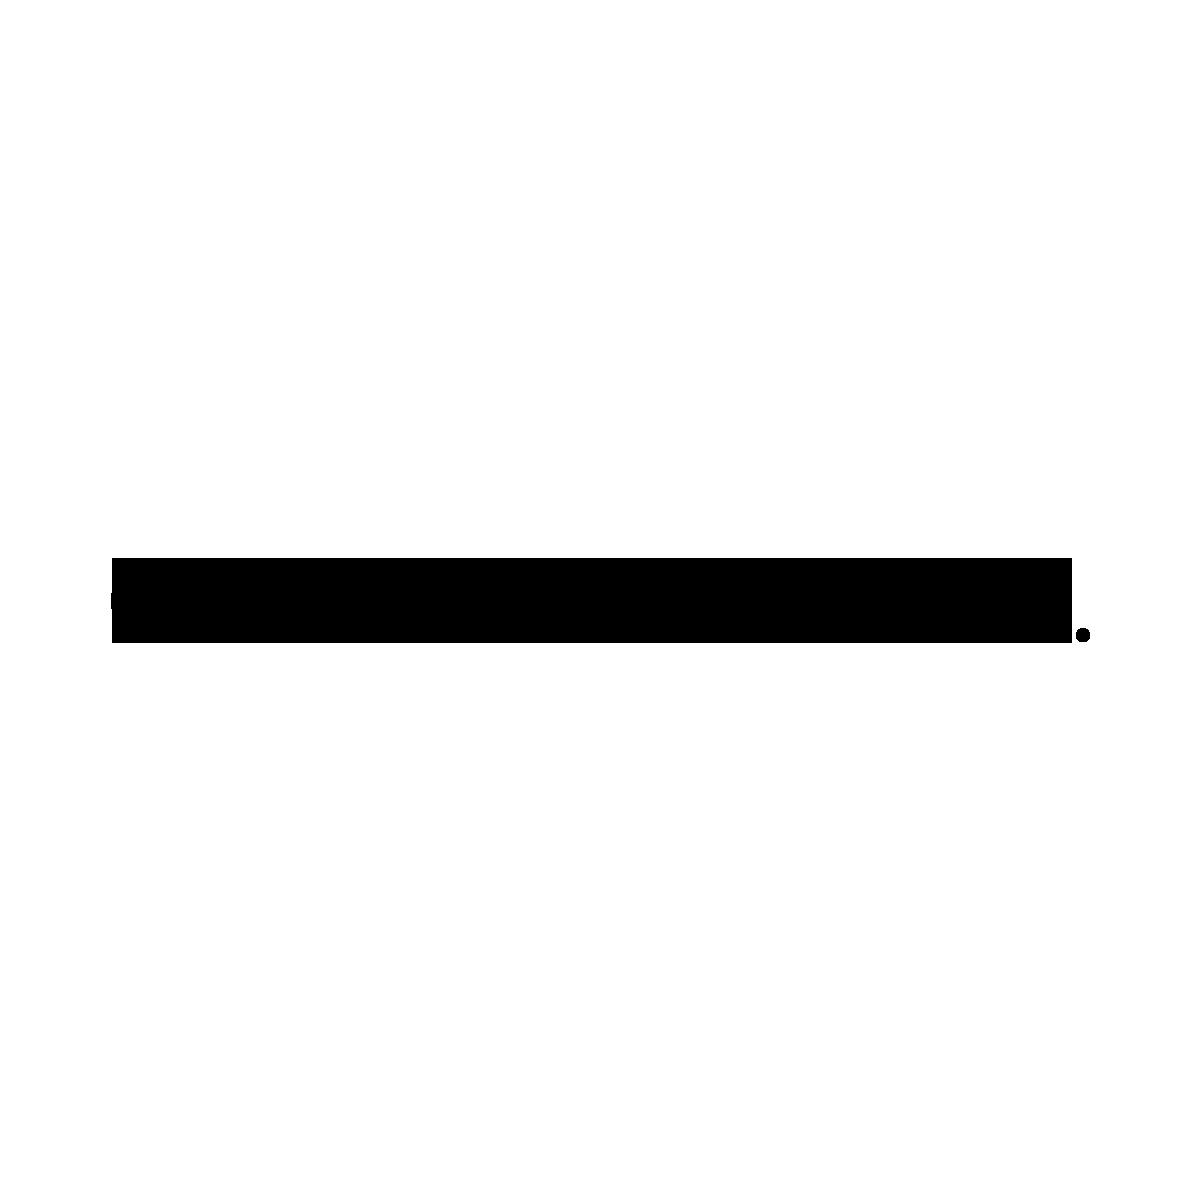 Handtasche-per-Hand-geschliffenes-Leder-Schwarz